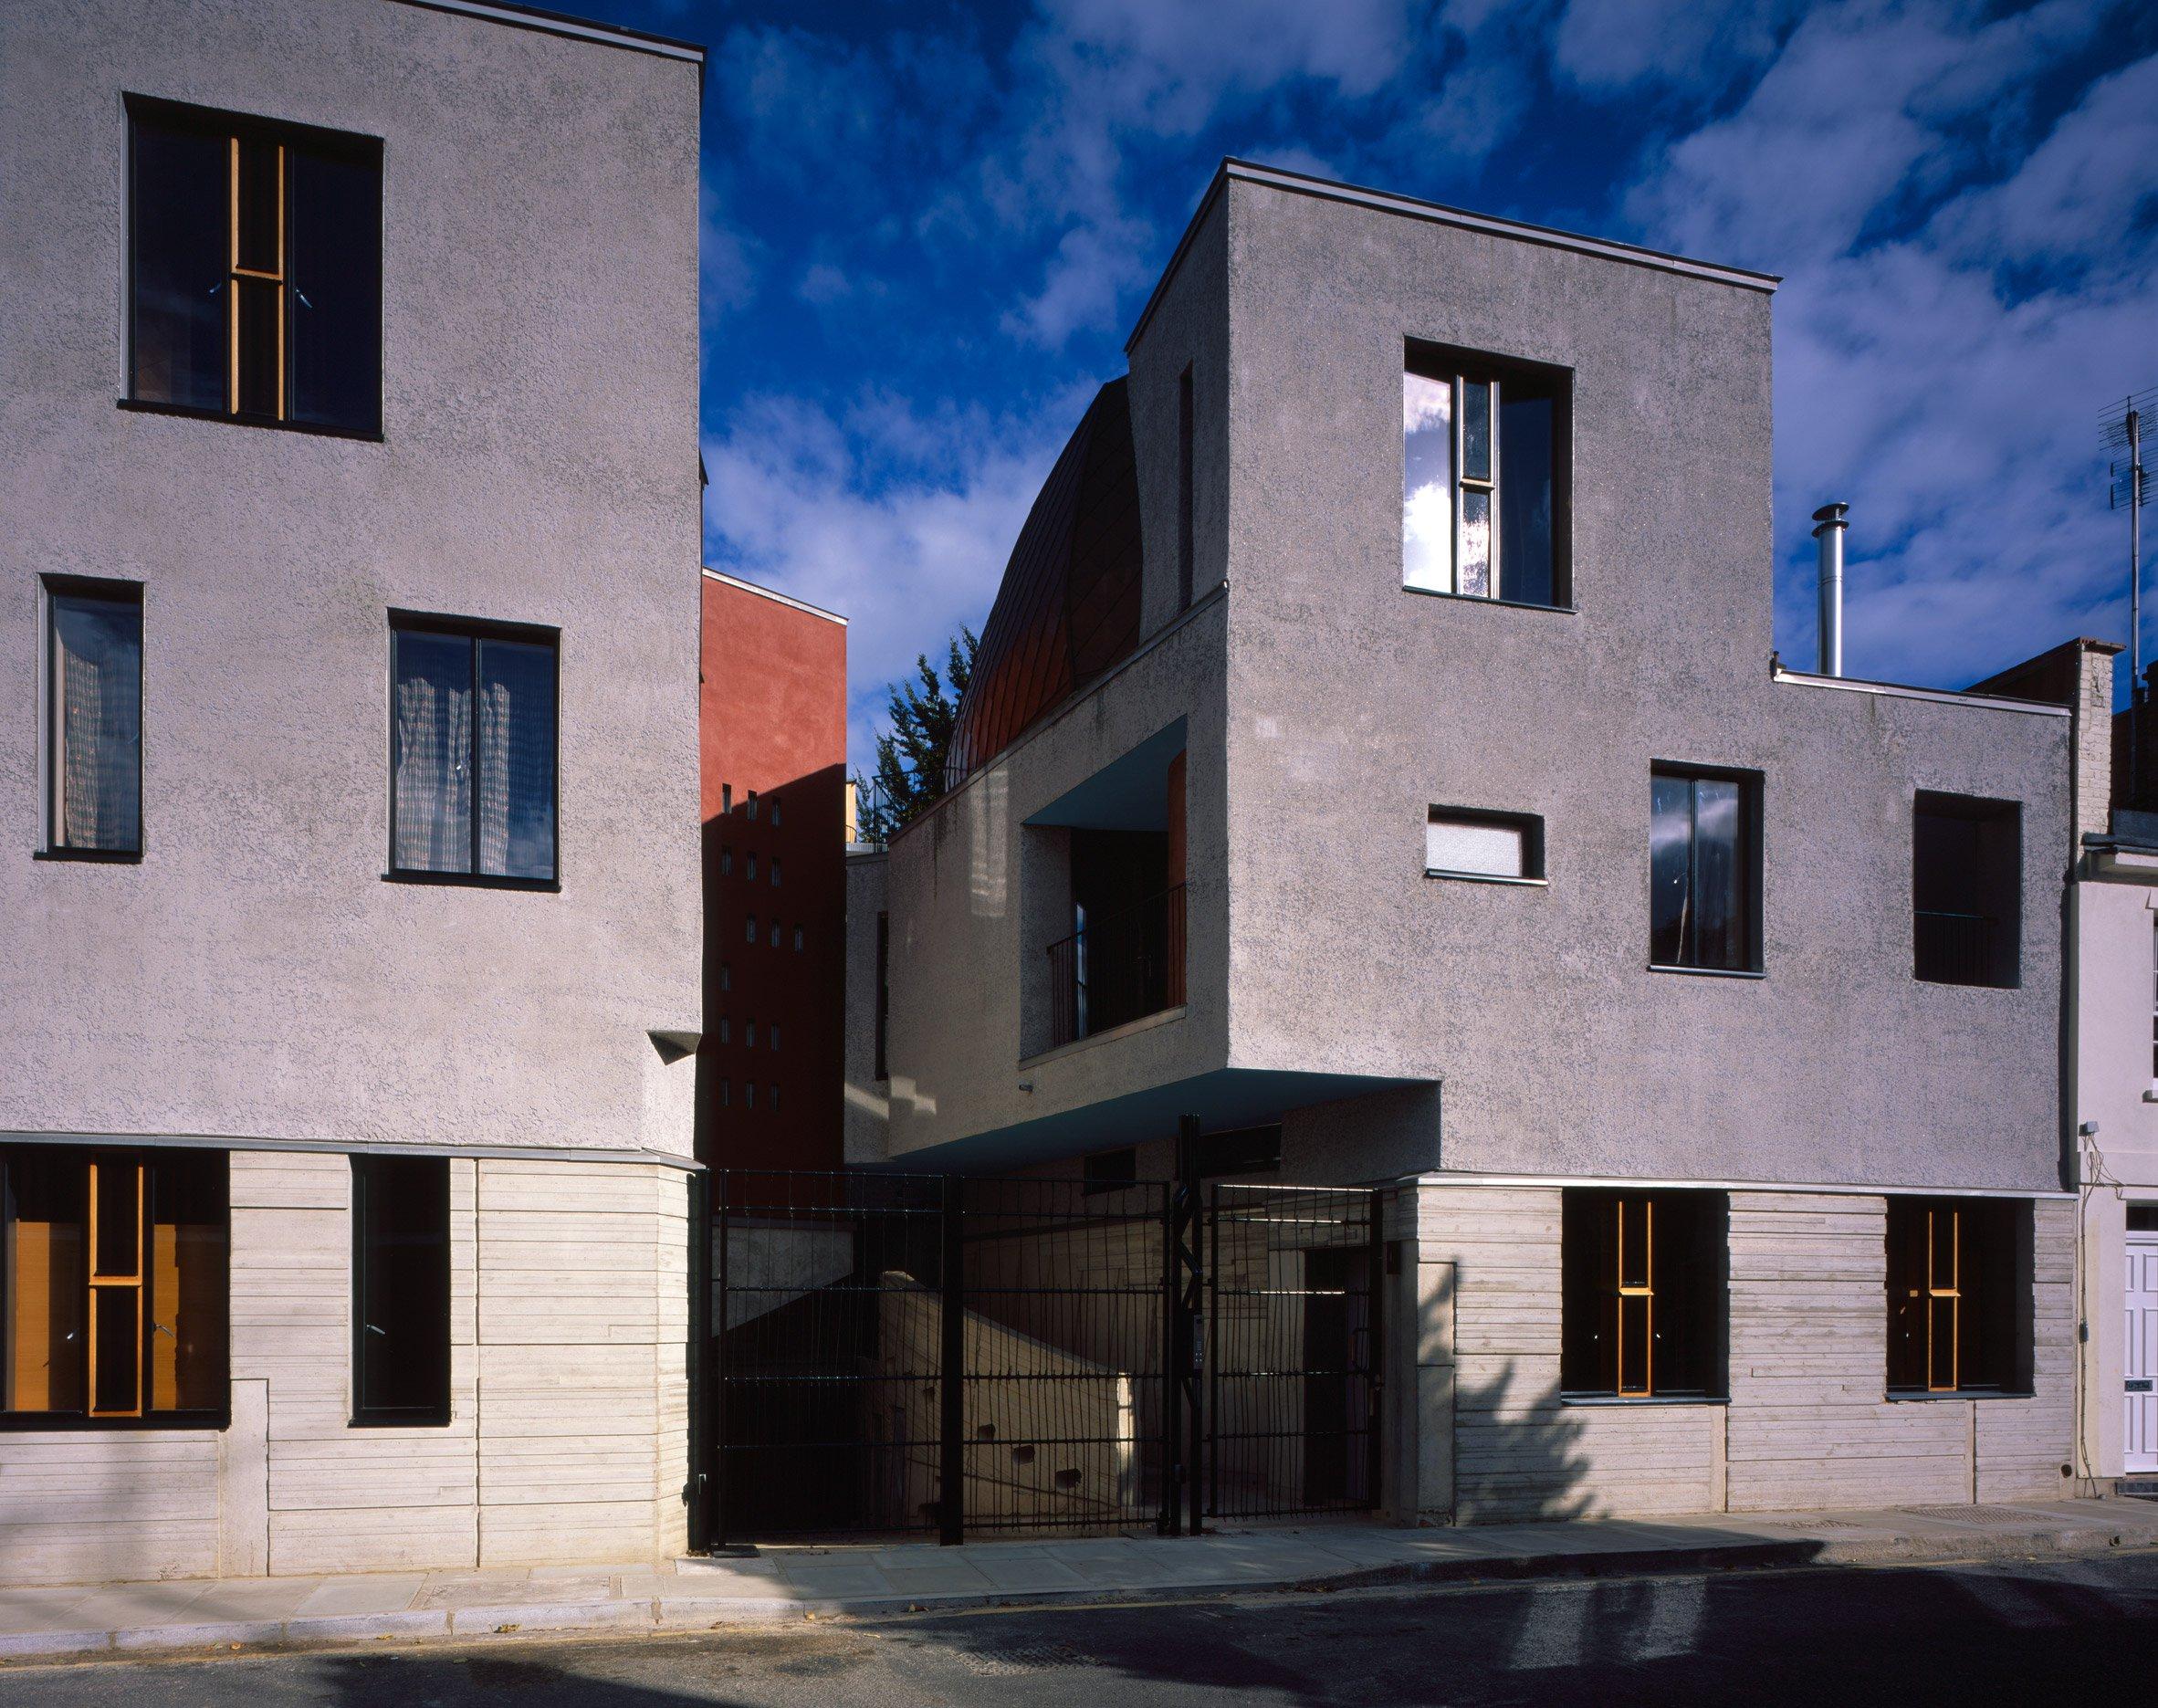 walmer-yard-architecture-residential-peter-salter-uk_dezeen_2364_col_3.jpg